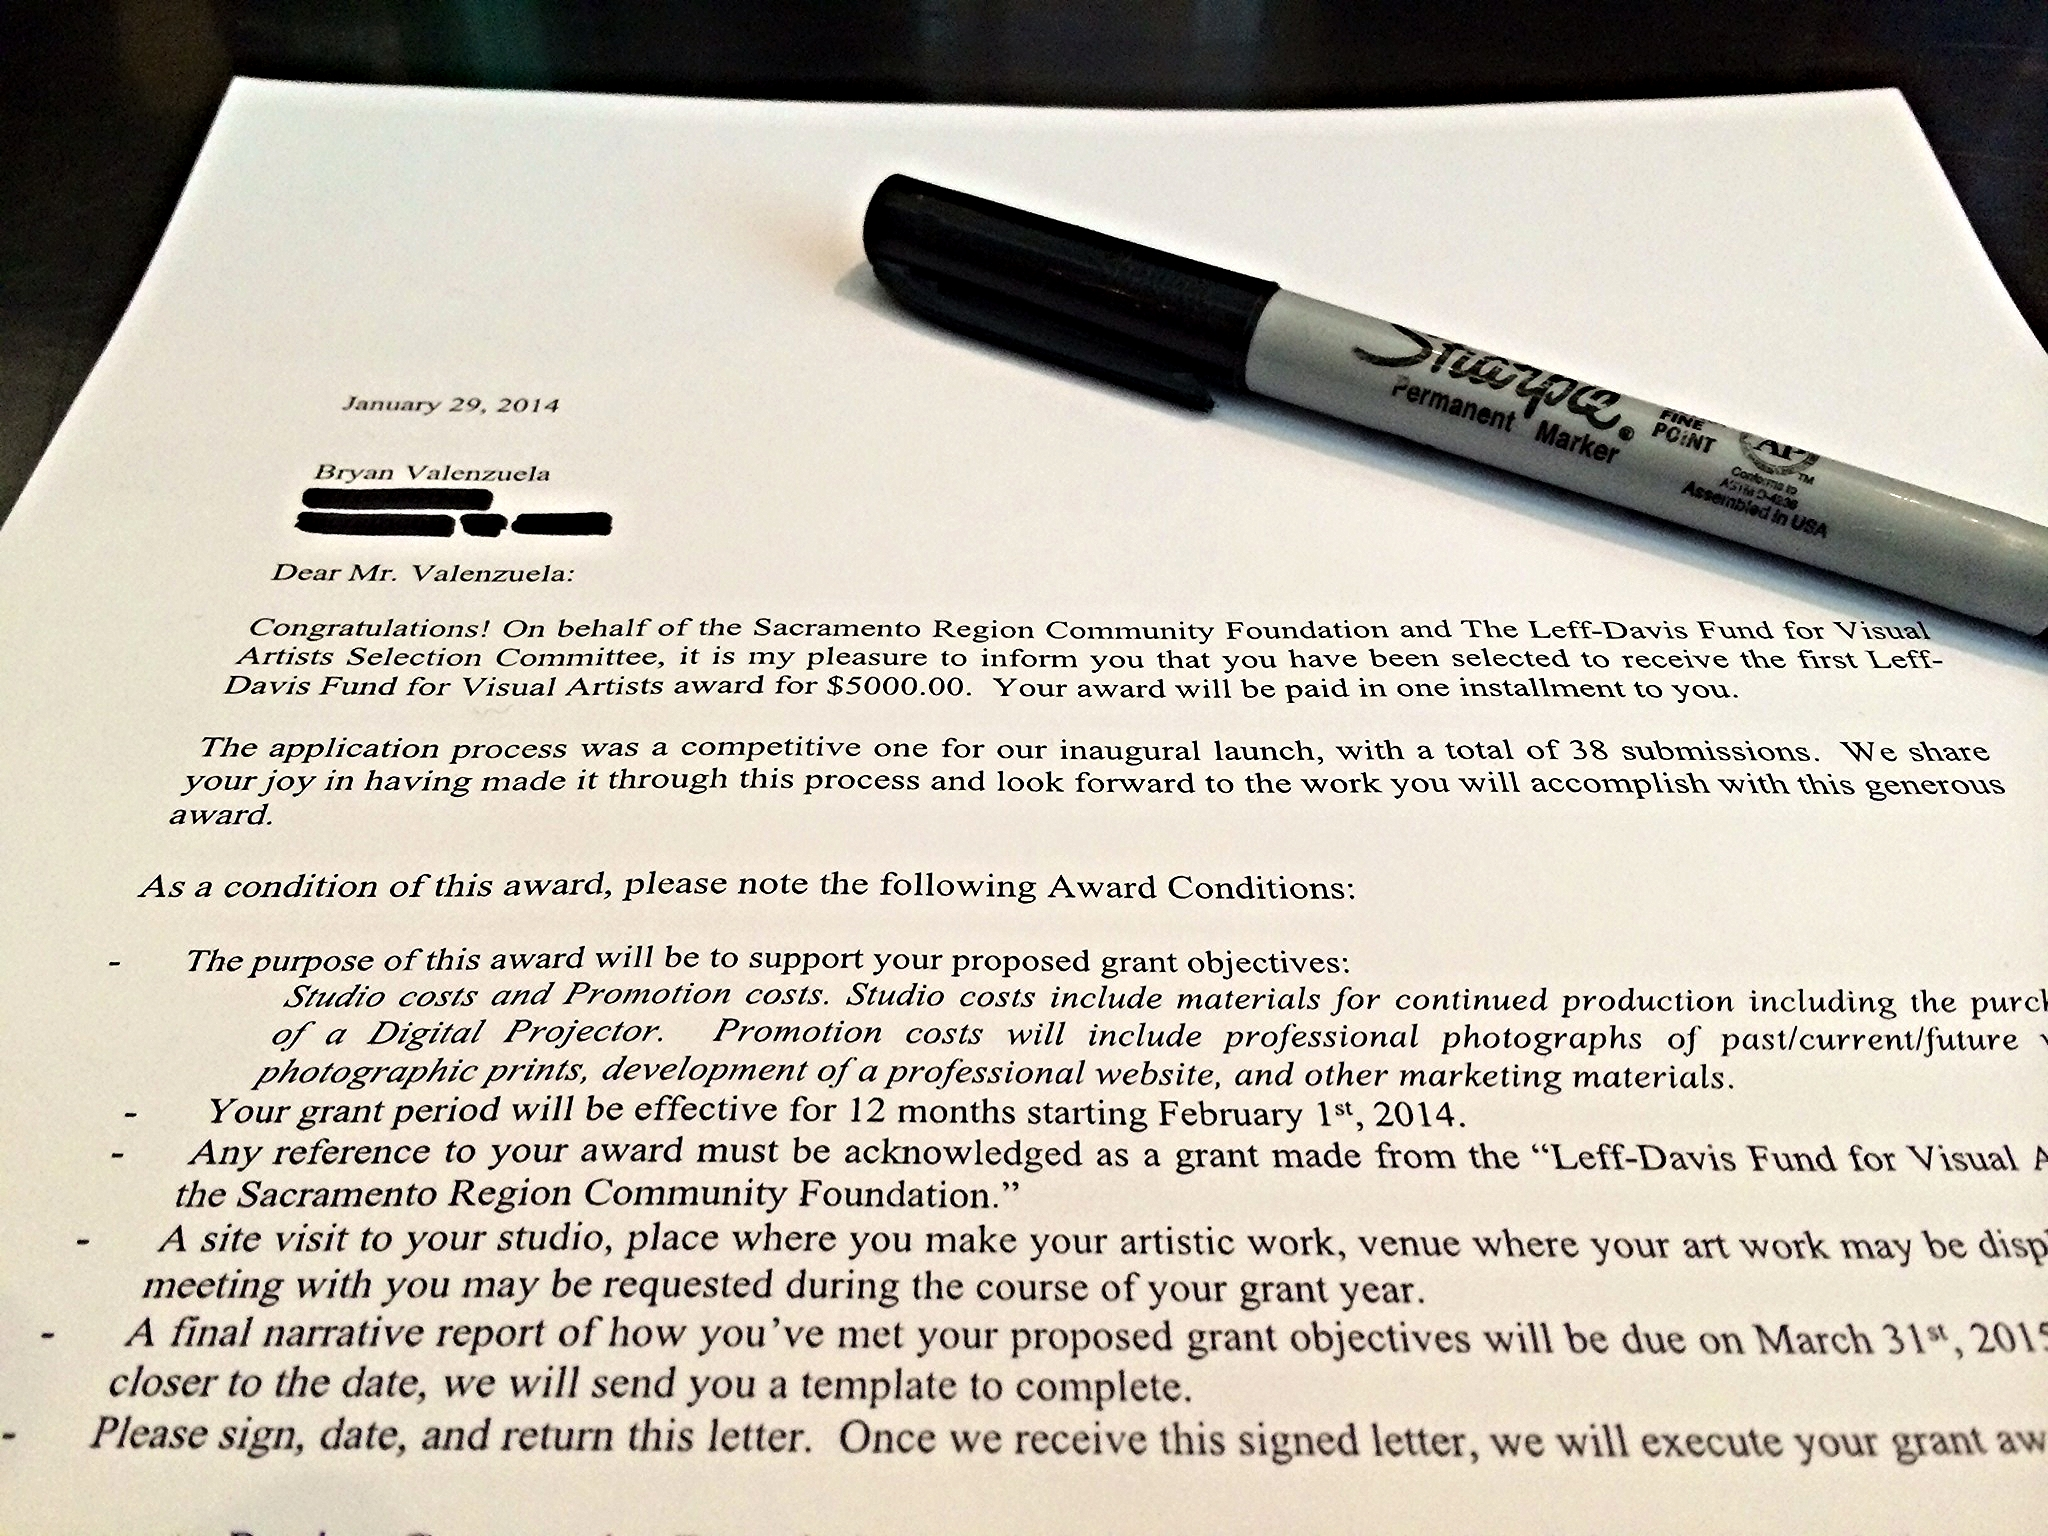 Grant contract